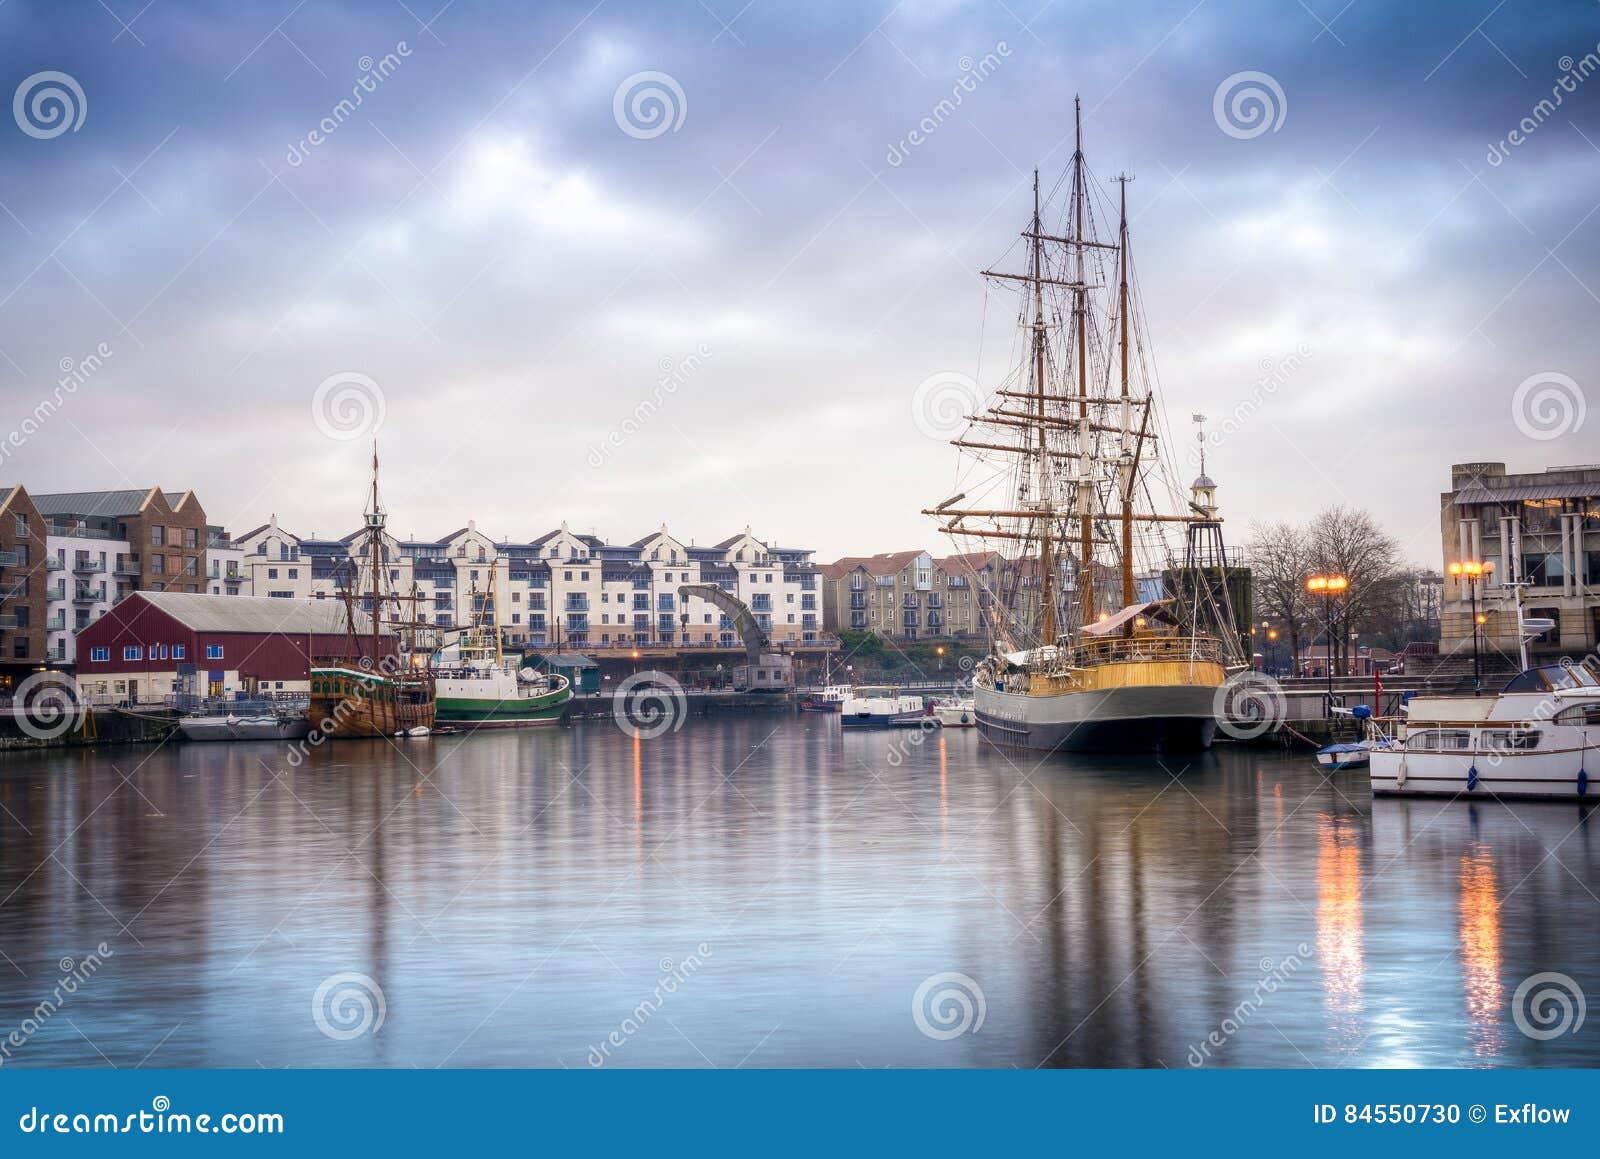 Download Ships docked at Bristol stock photo. Image of bristols - 84550730